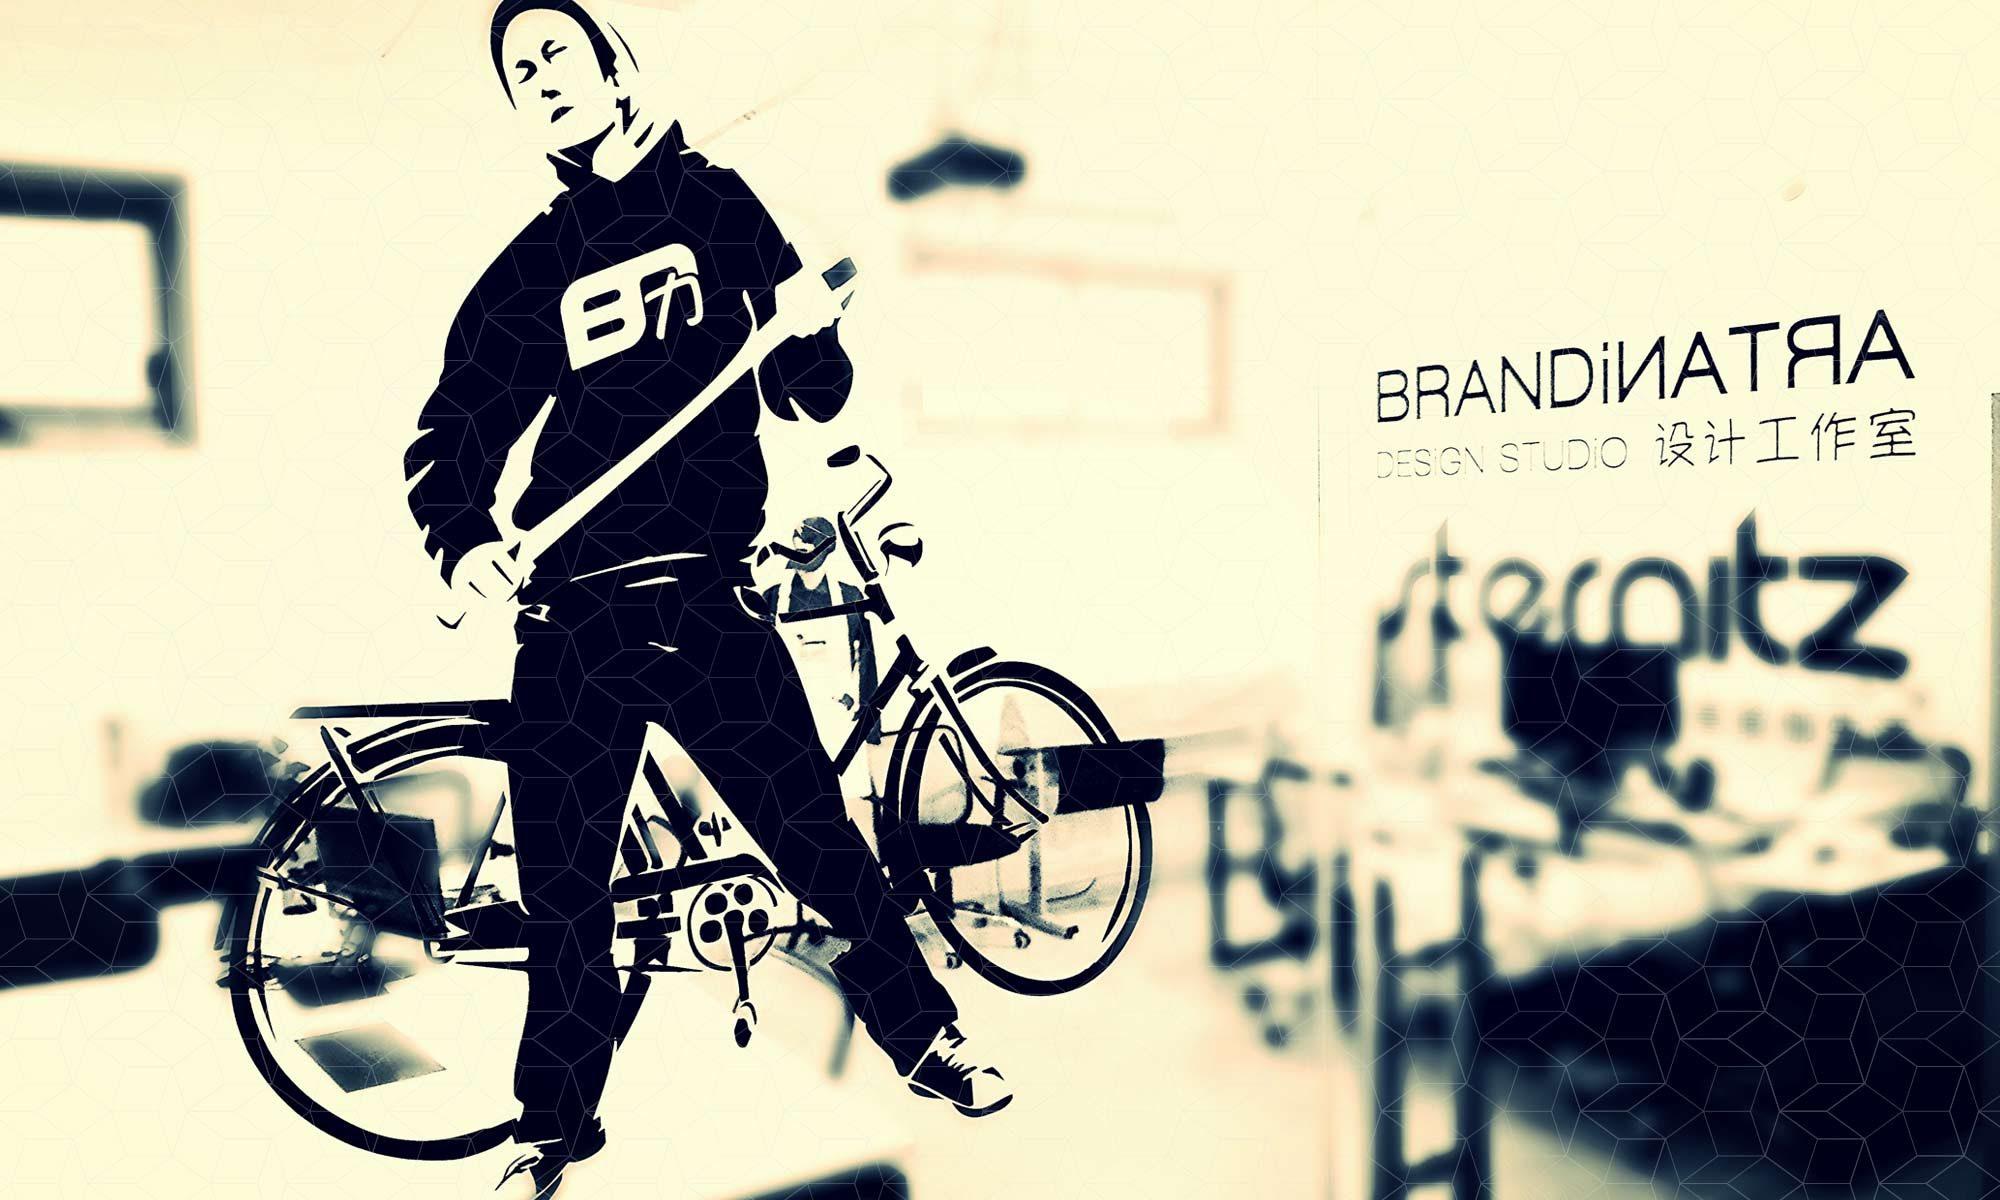 BRANDINATRA DESIGN STUDIO